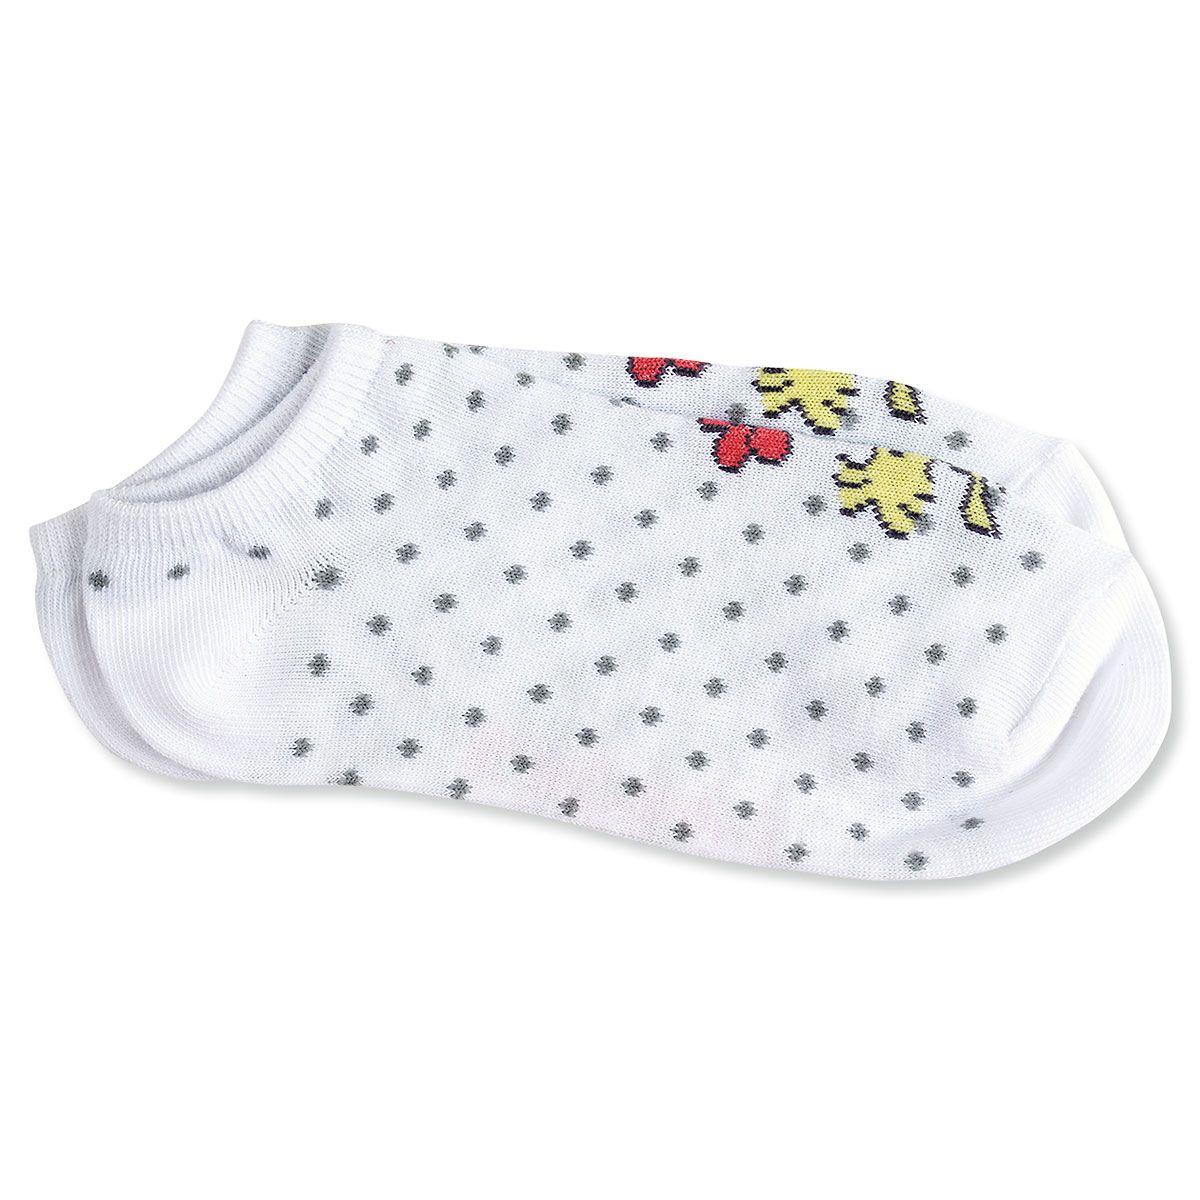 PEANUTS® Love Socks